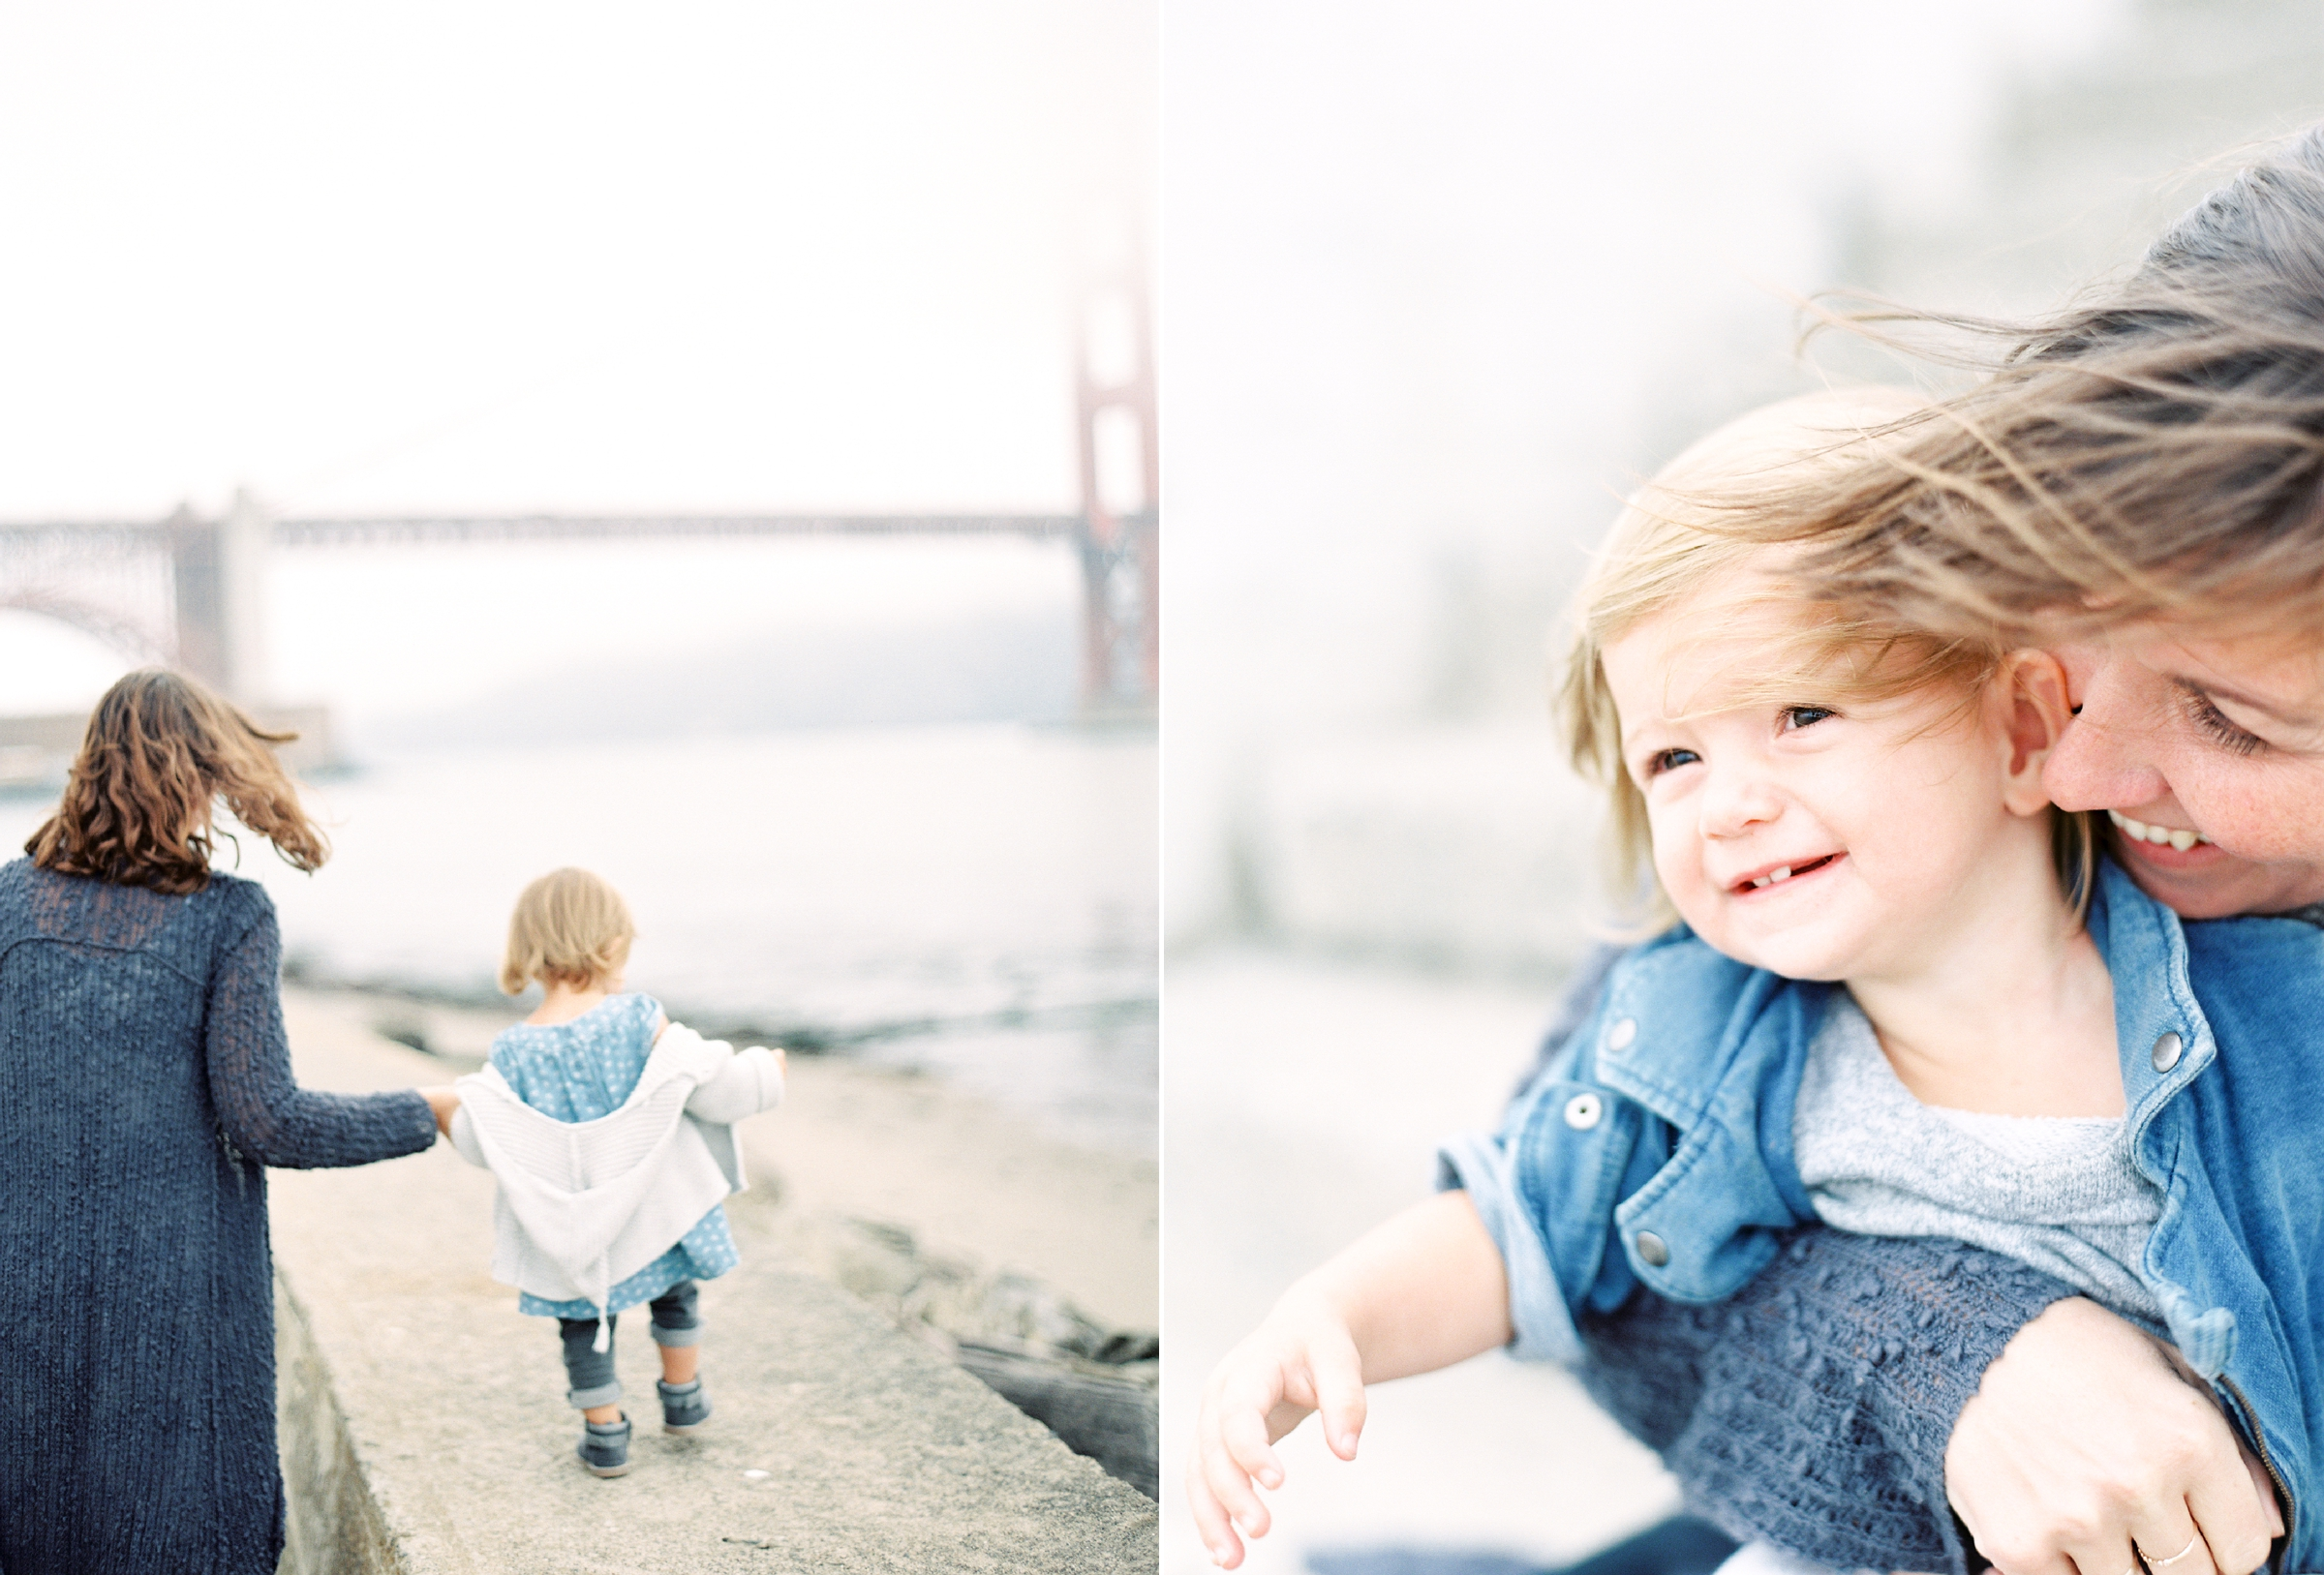 san_francisco_california_fine_art_family_photographer_shannon_griffin_0043.jpg